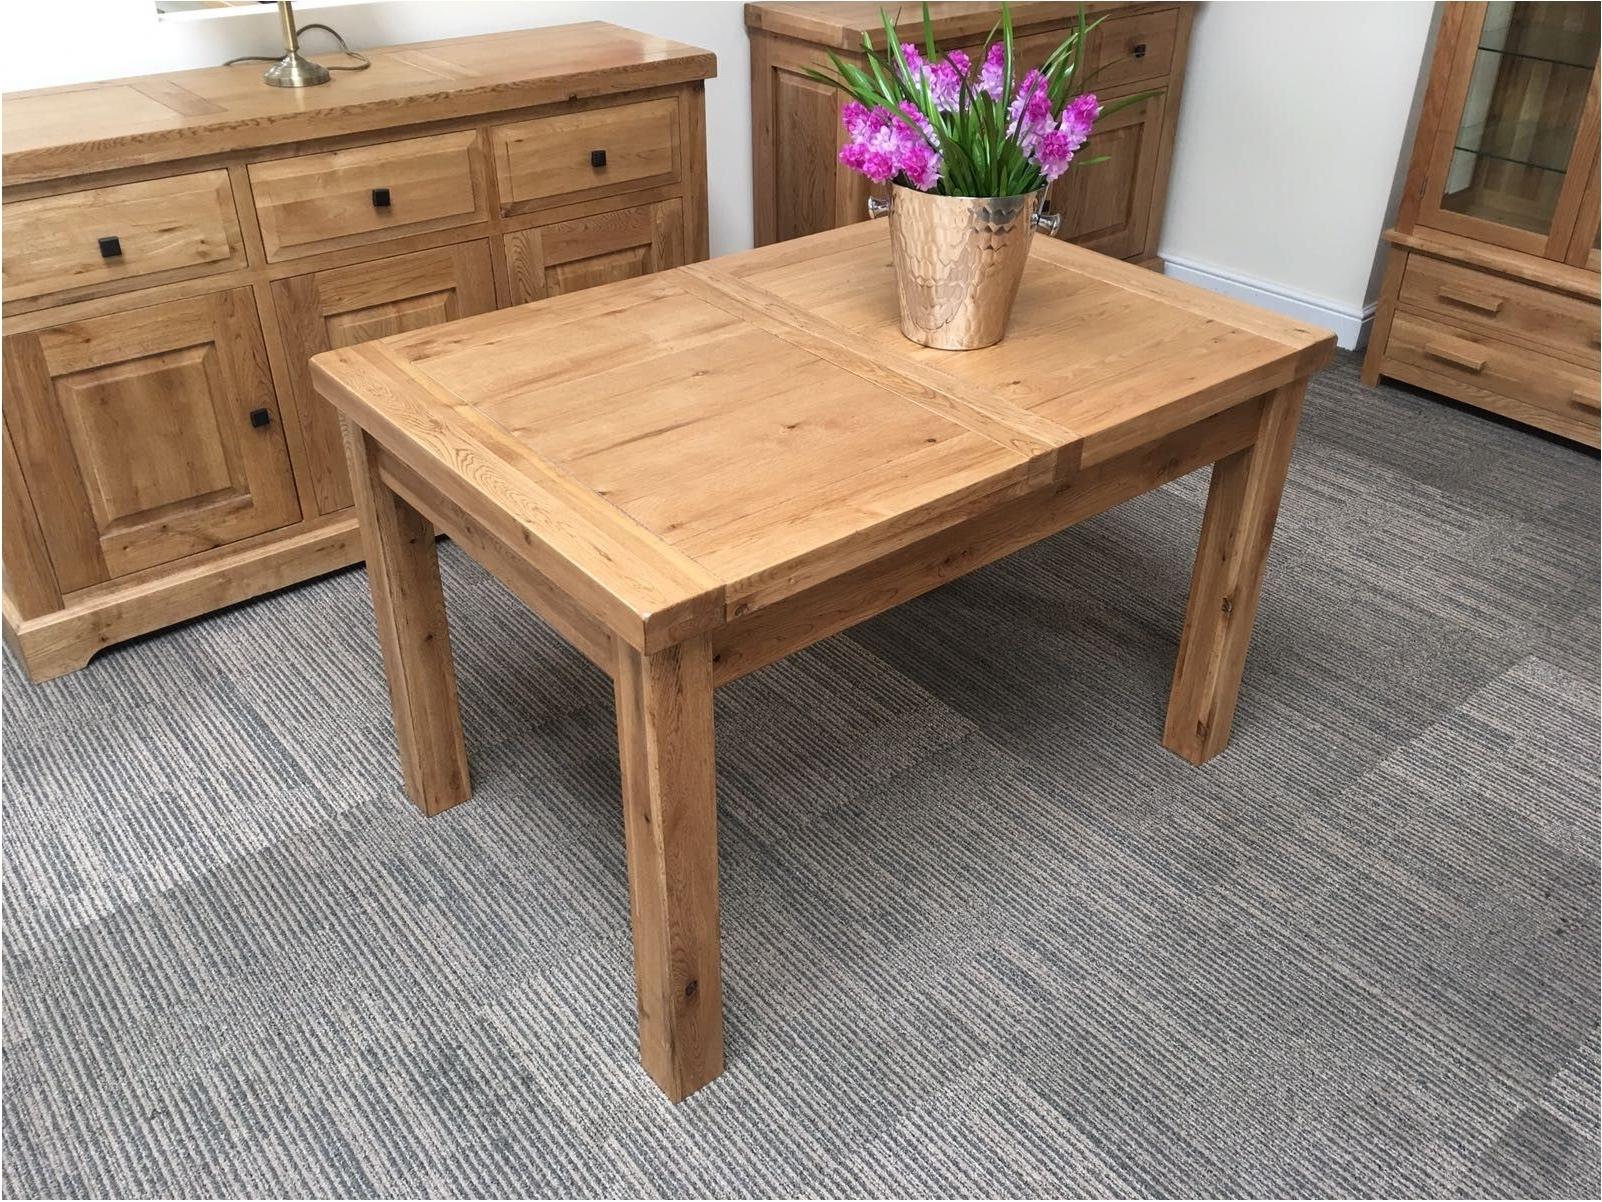 2018 Oak Extending Dining Sets Regarding Best Block Solid Oak Dining Tablerevive Joinery – Oak Furniture (View 13 of 25)